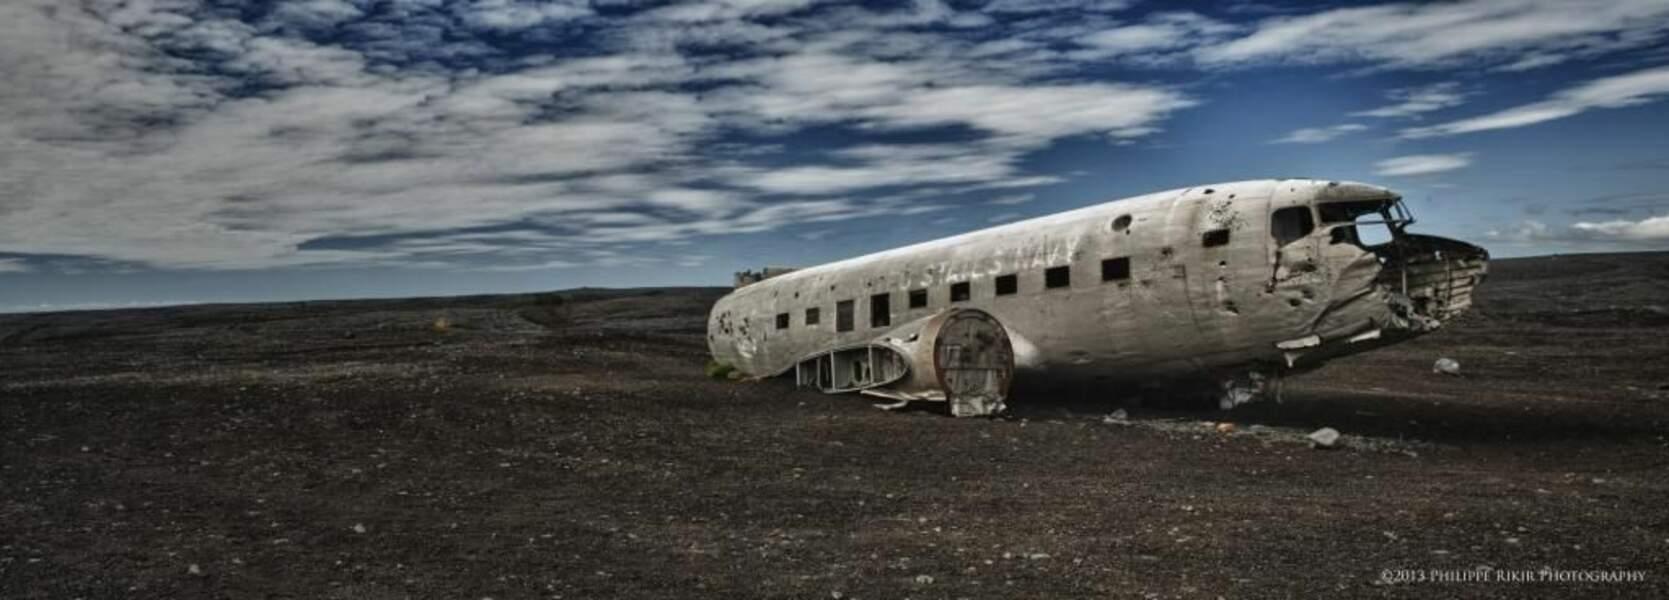 Photo prise en Islande par le GEOnaute : Rikirp